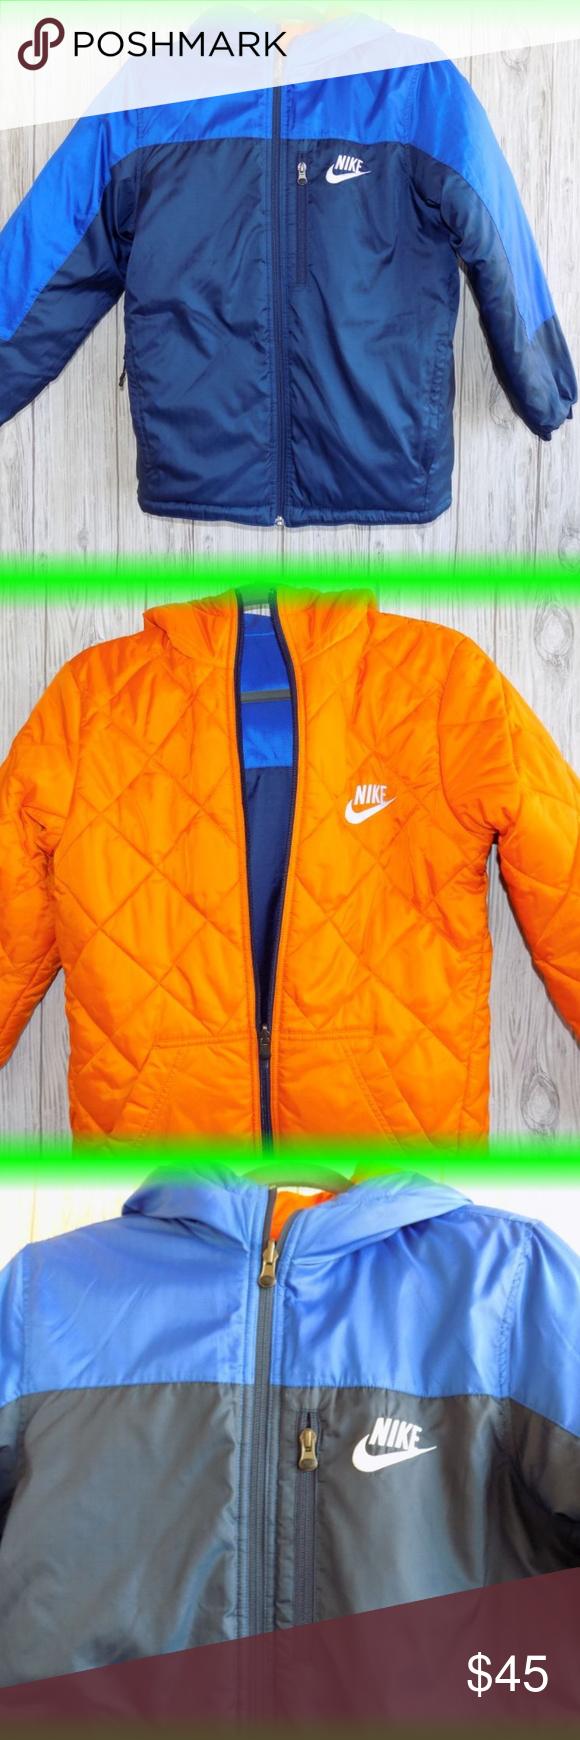 Nike Boy Winter Coat Jacket Hooded 10 14 Medium Boys Winter Coats Winter Coats Jackets Jackets [ 1740 x 580 Pixel ]